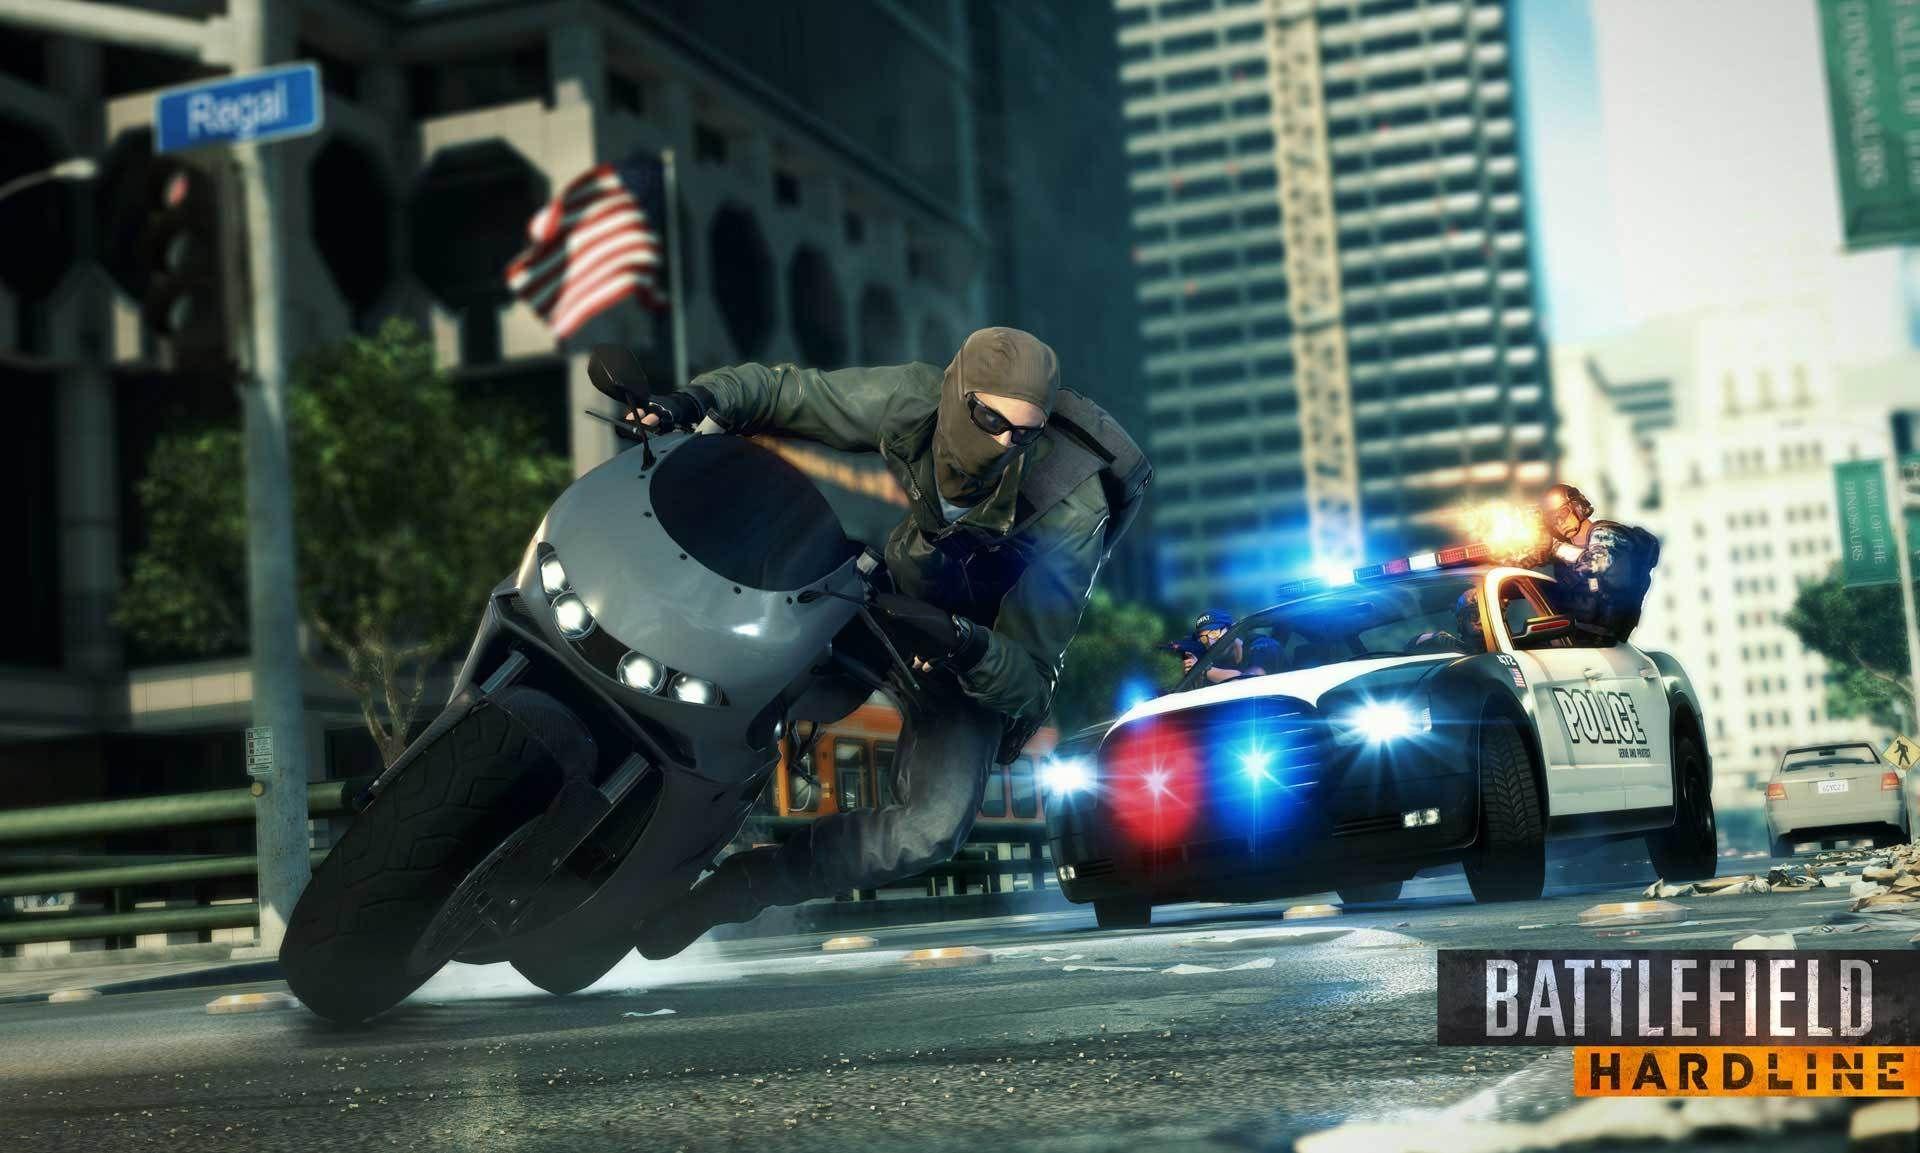 Battlefield Hardline Dlc Packs Confirmed Battlefield Hardline Battlefield Games Xbox One